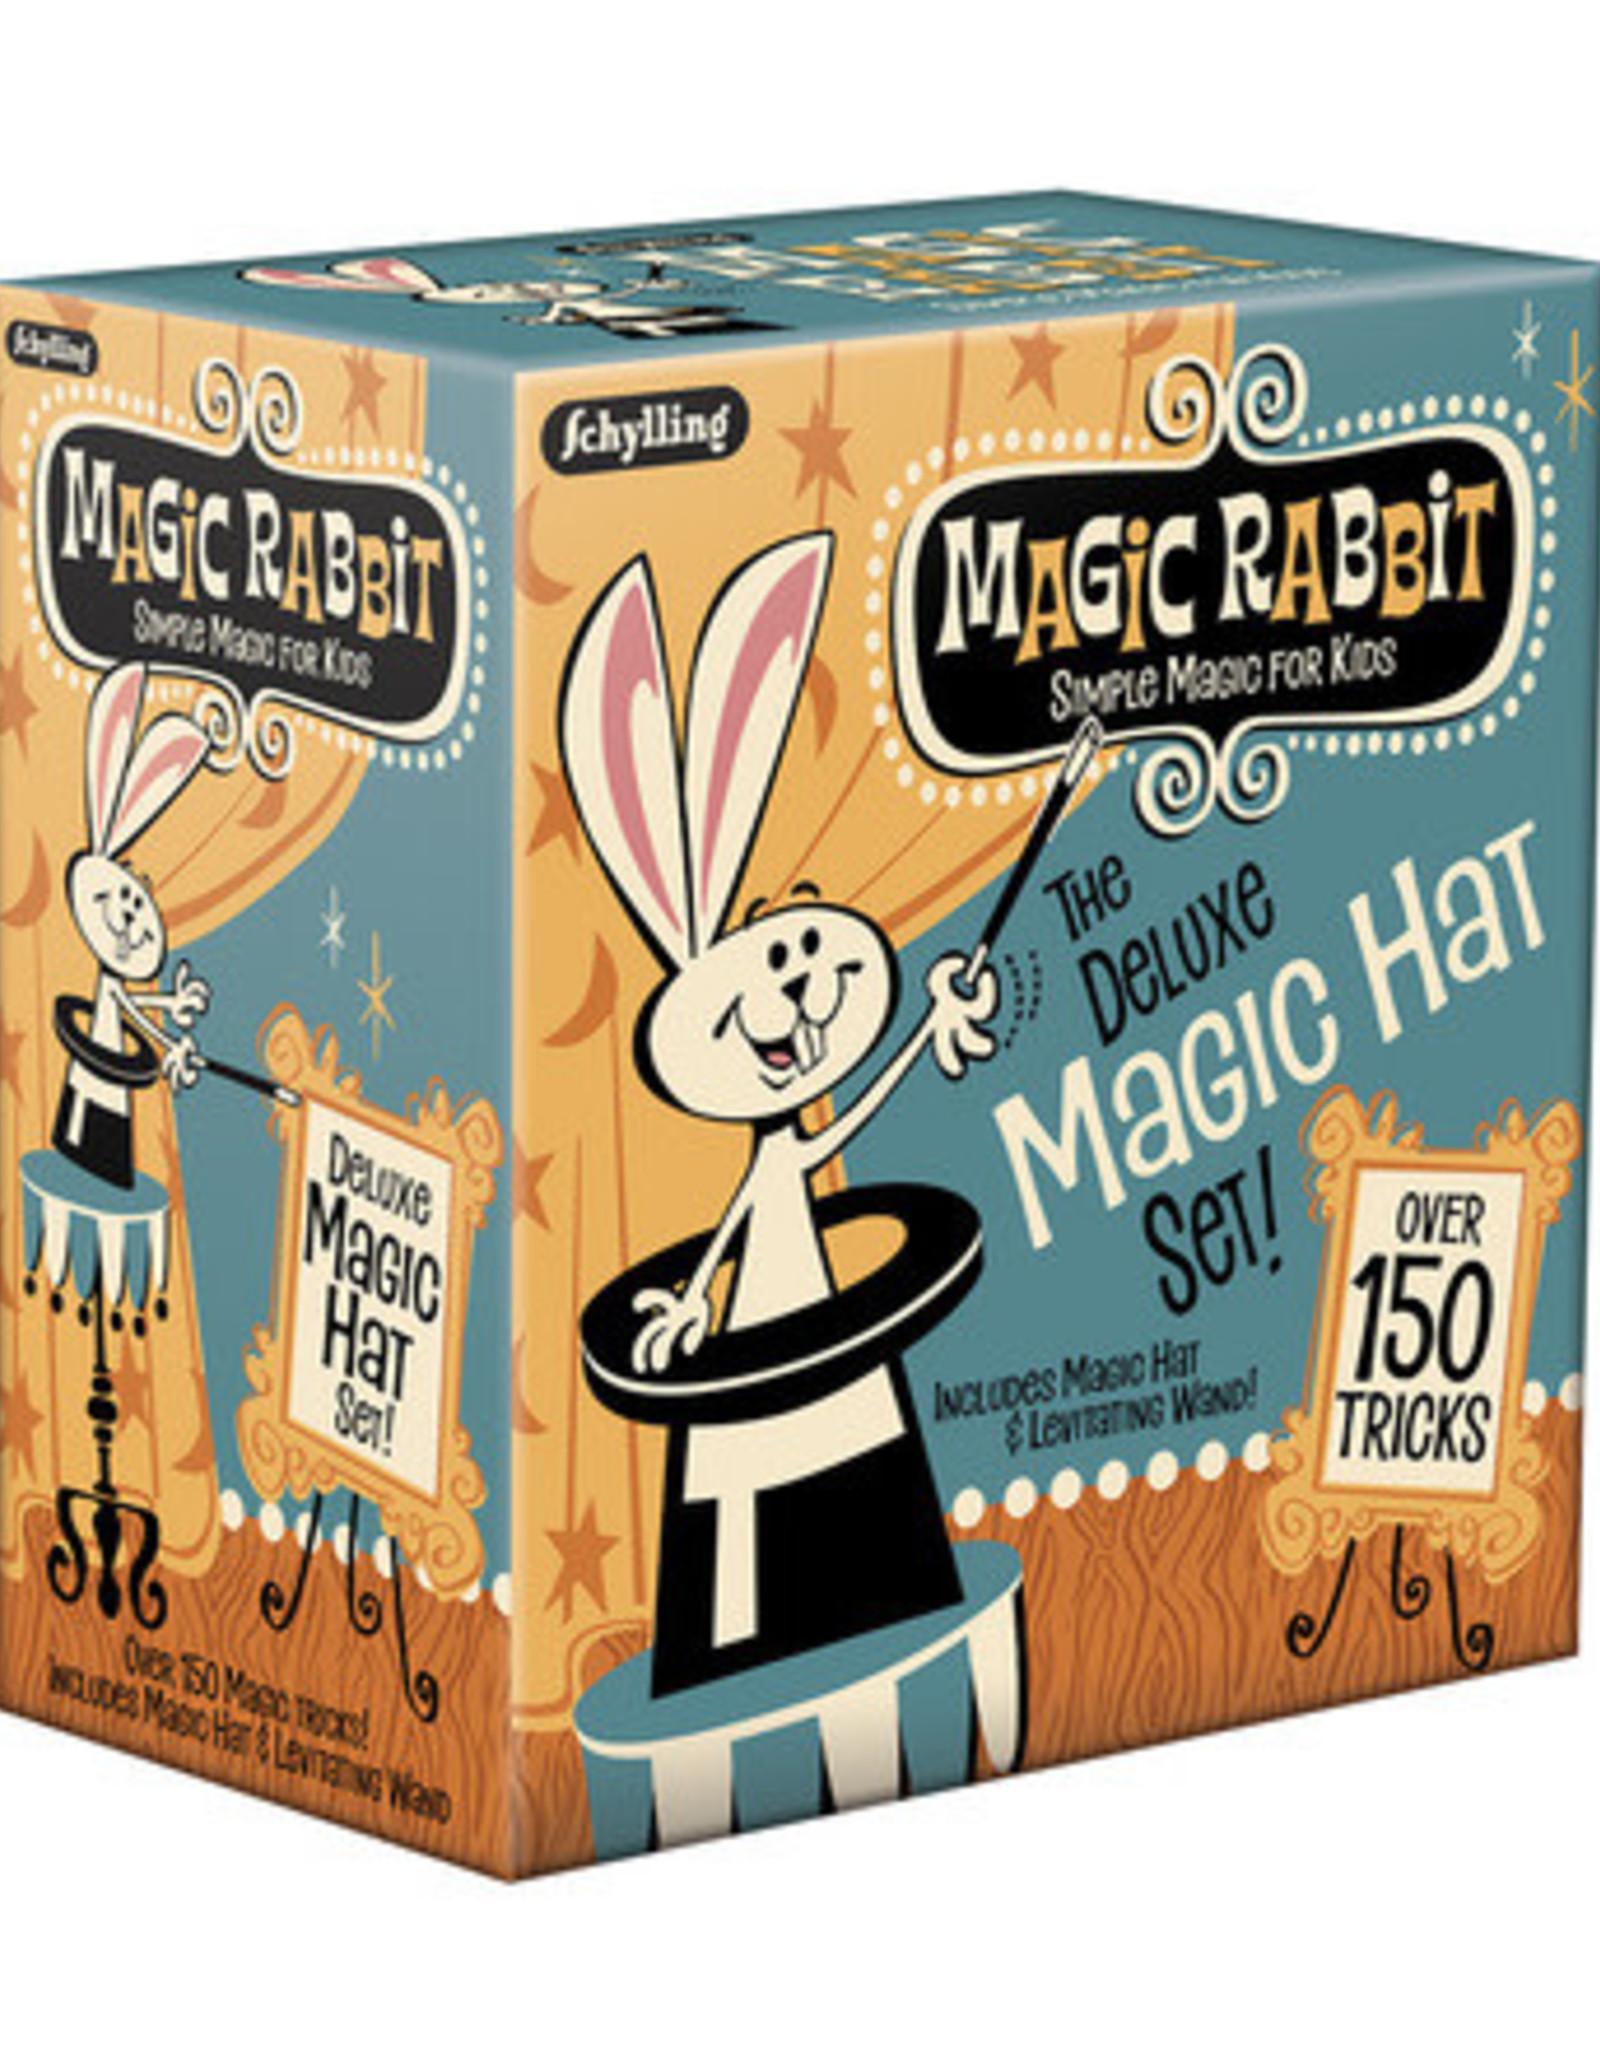 Schylling Deluxe Magic Hat Set